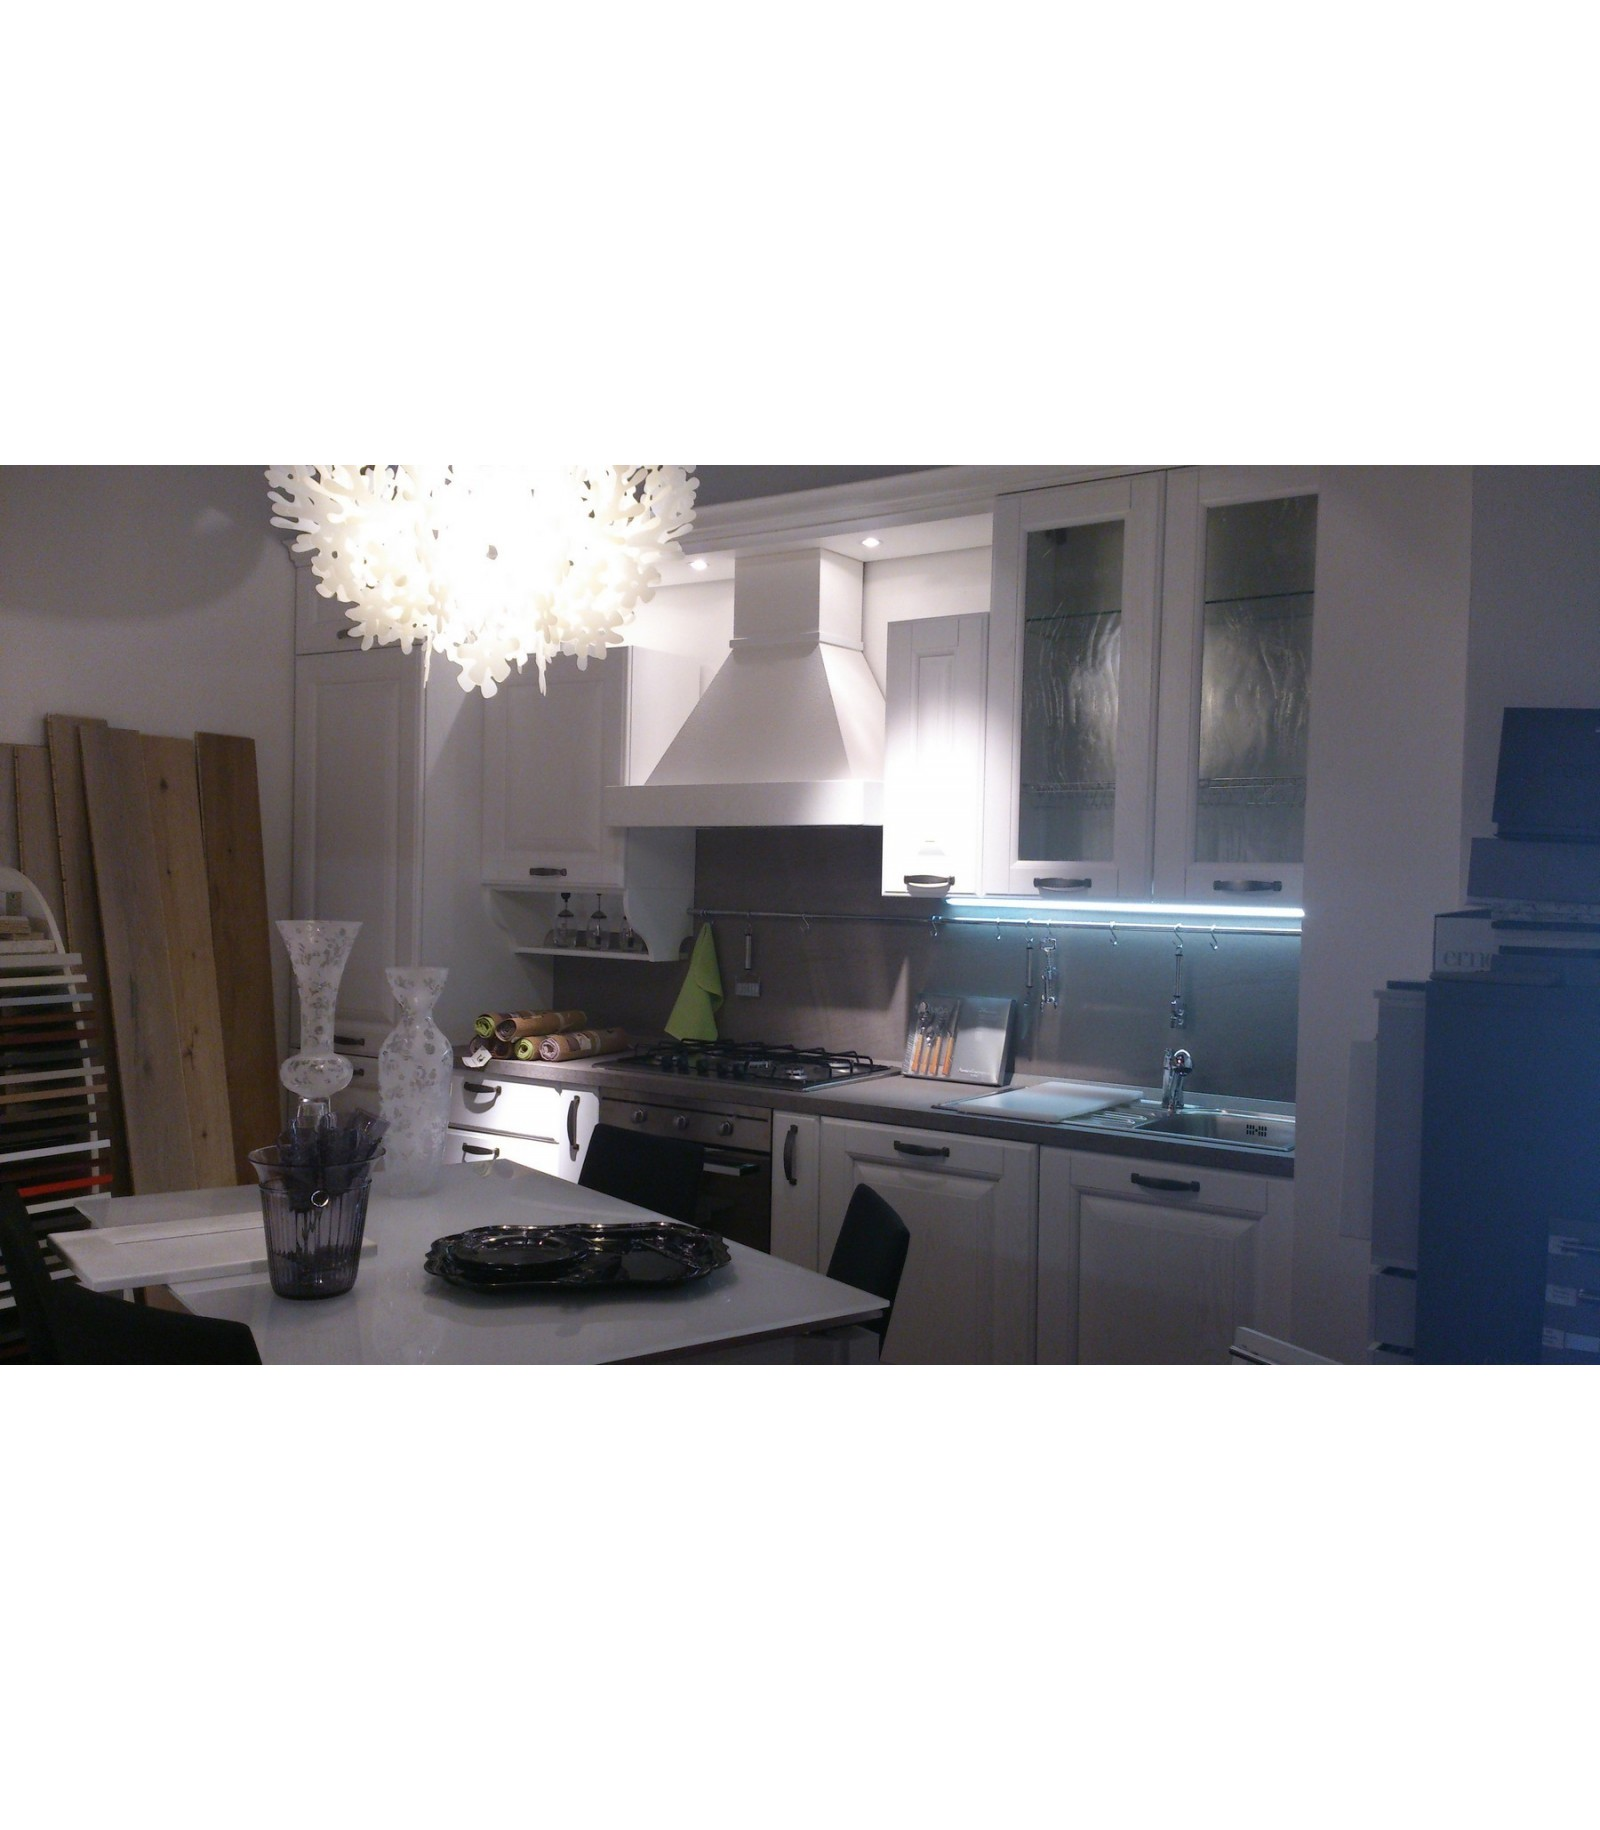 Cucina paola decap la casa moderna mariotti casa for La casa moderna